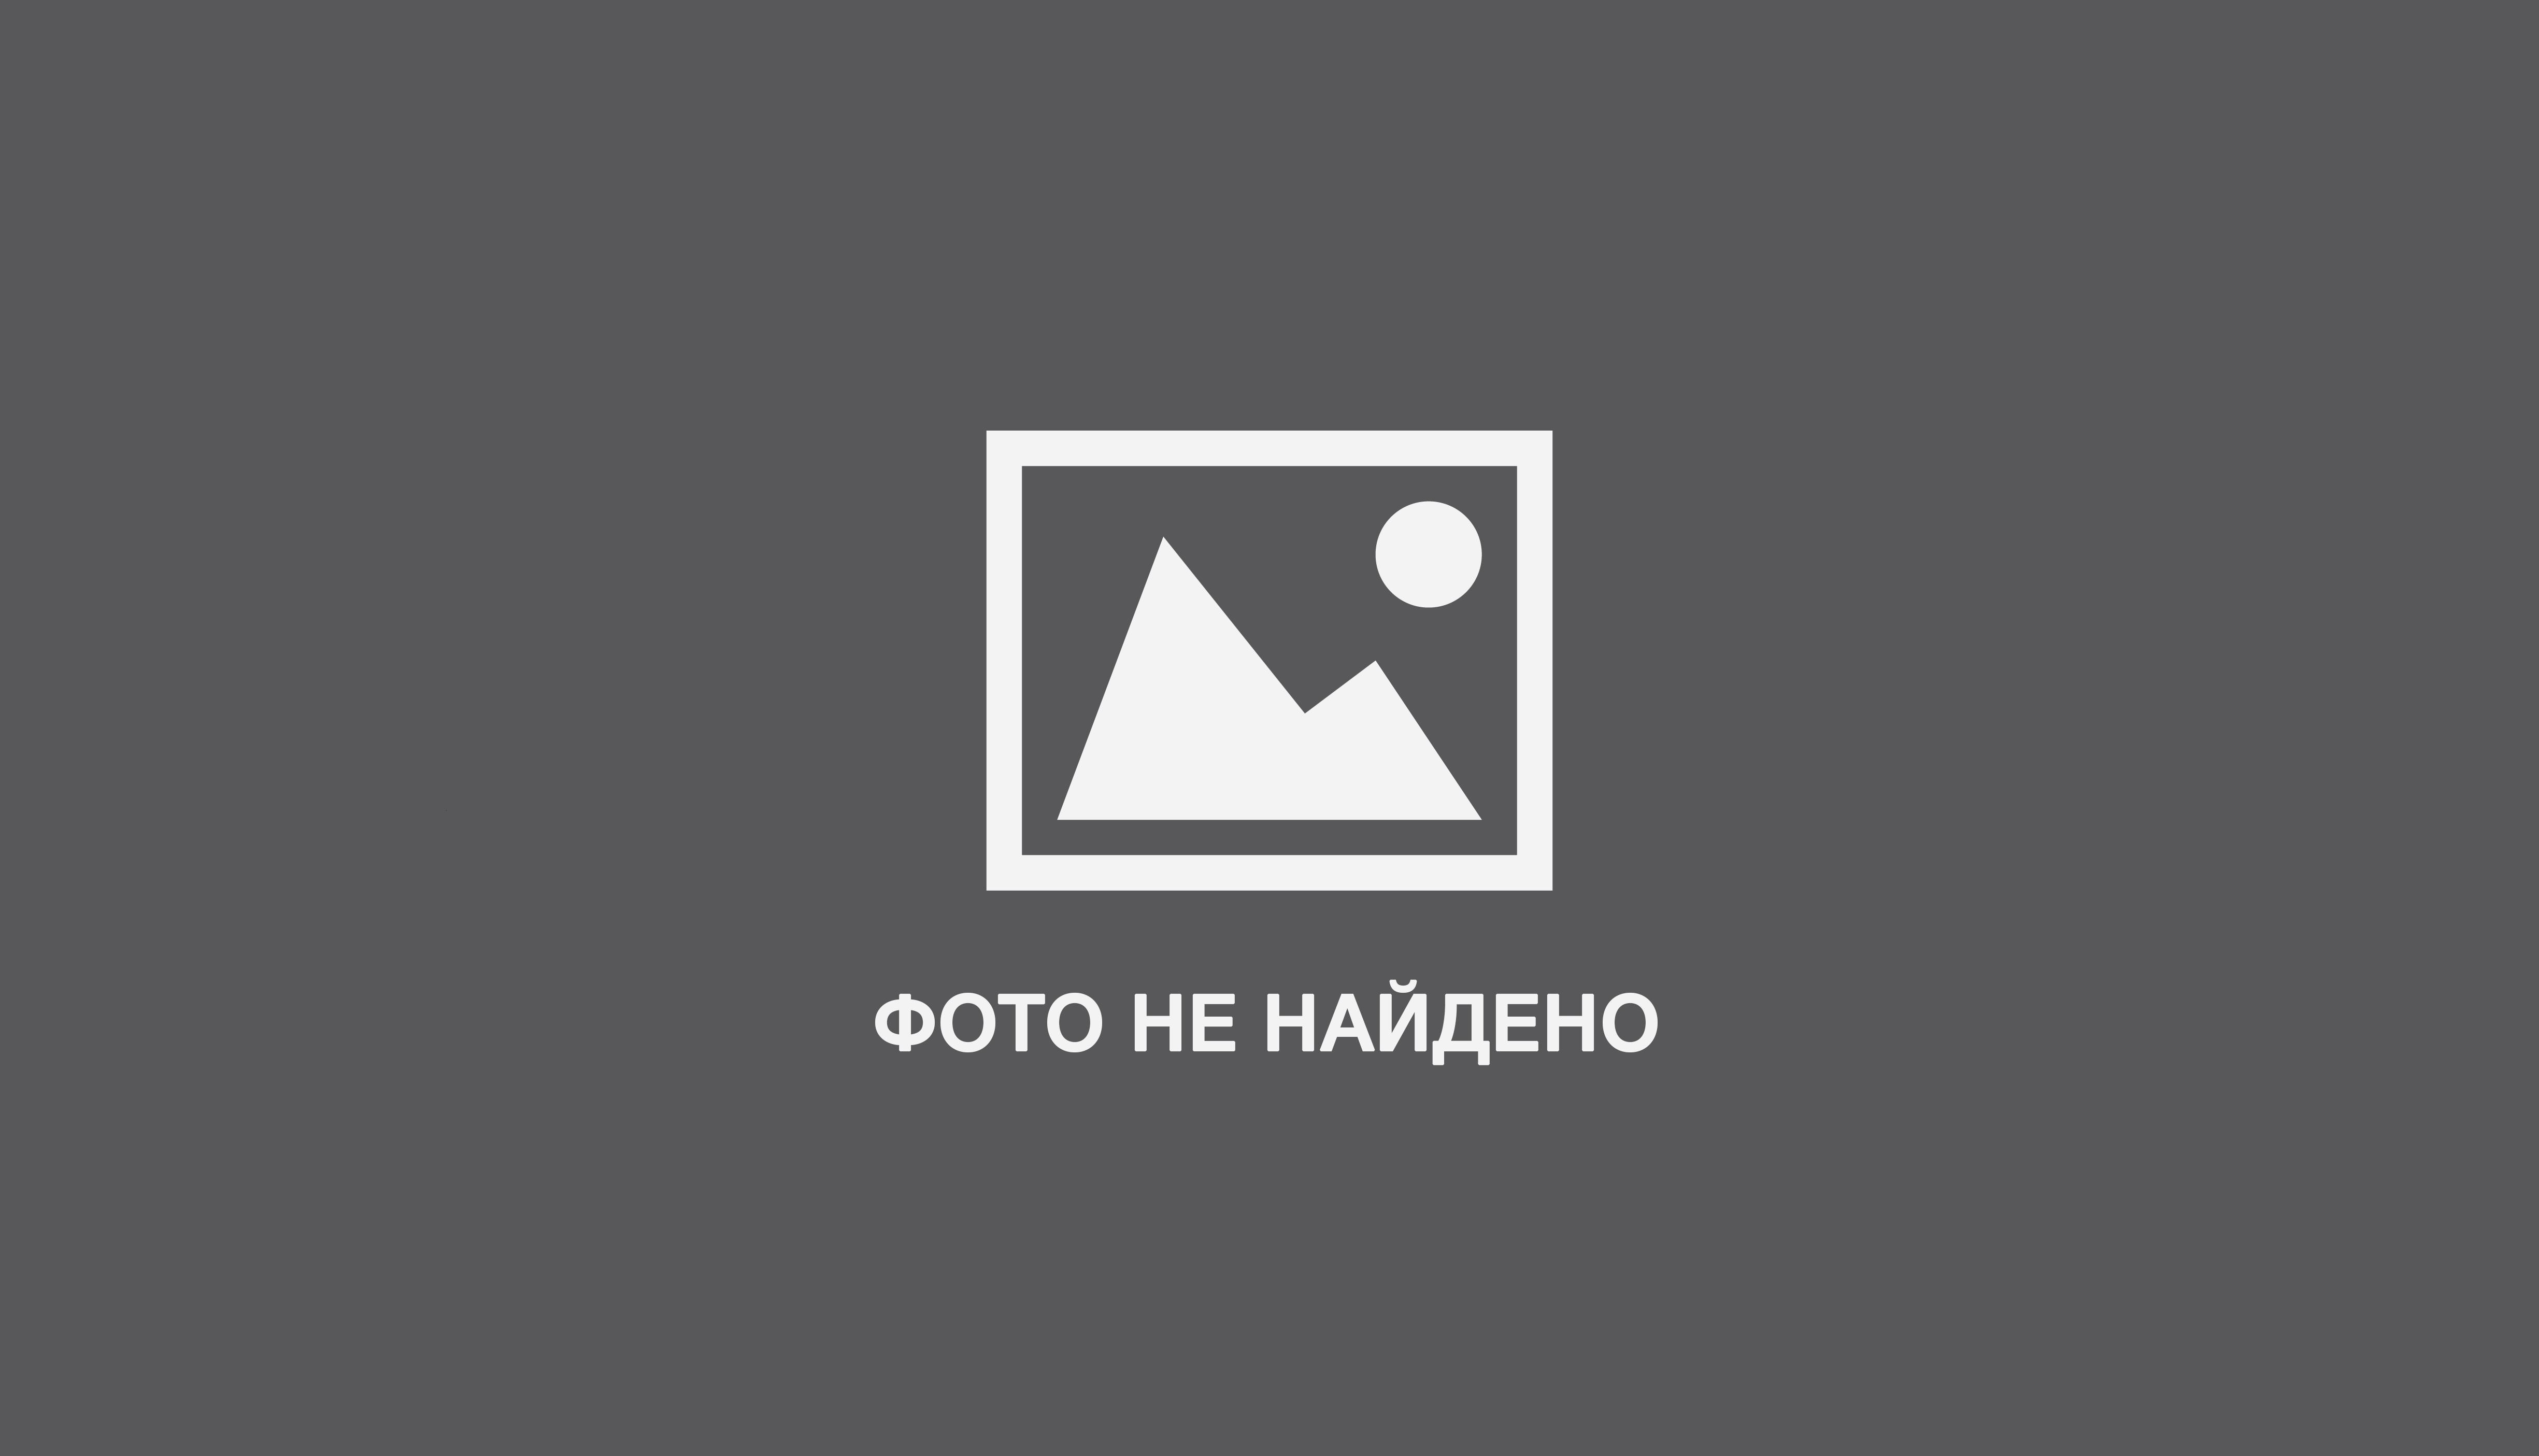 На майках футболистов «Динамо» (Брест) фамилии будут писаться по-белорусски